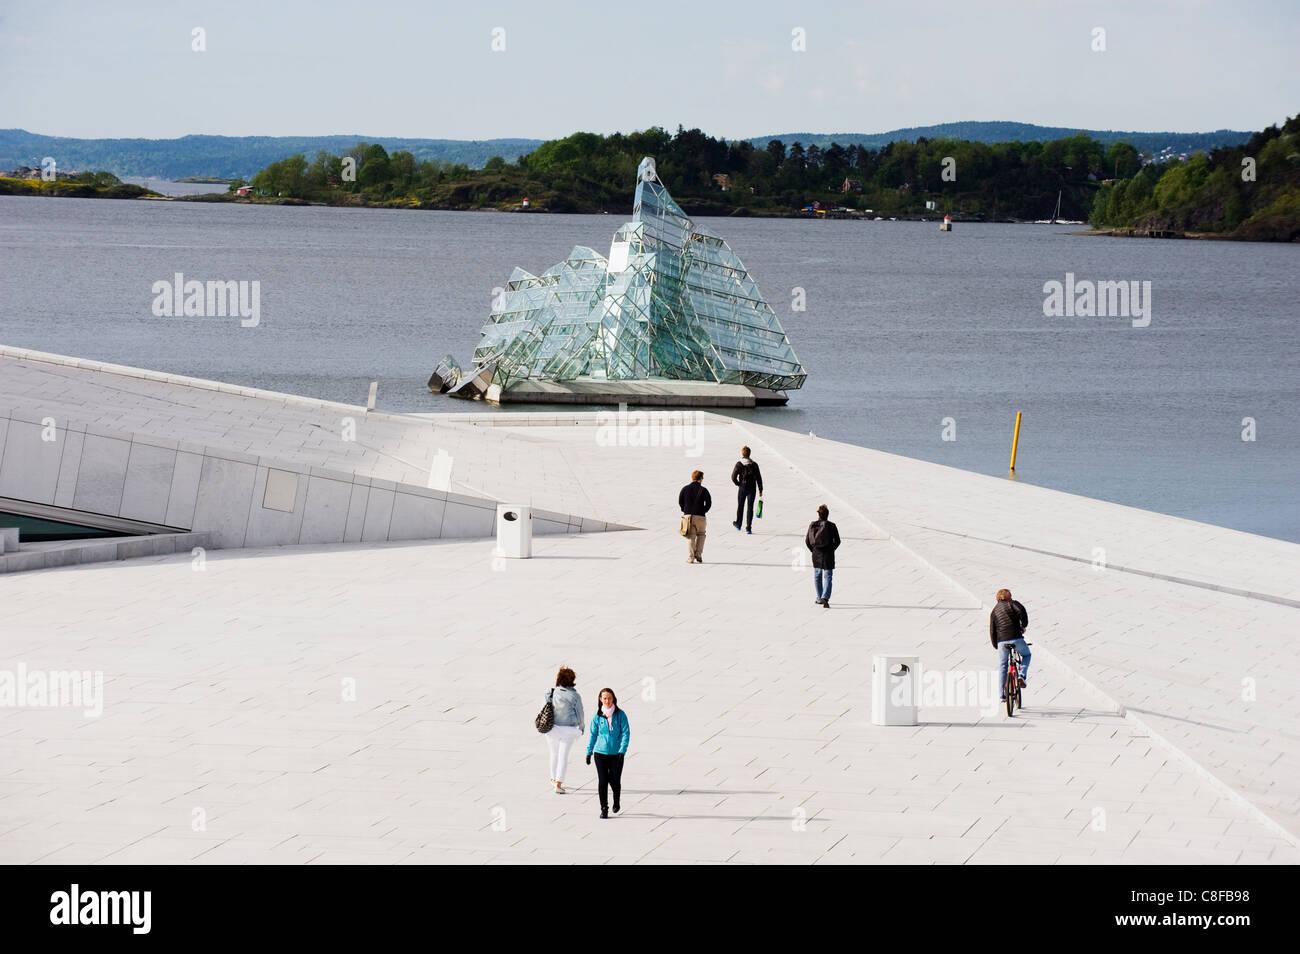 Floating art iceberg on the waterfront in Oslofjord, Oslo, Scandinavia - Stock Image